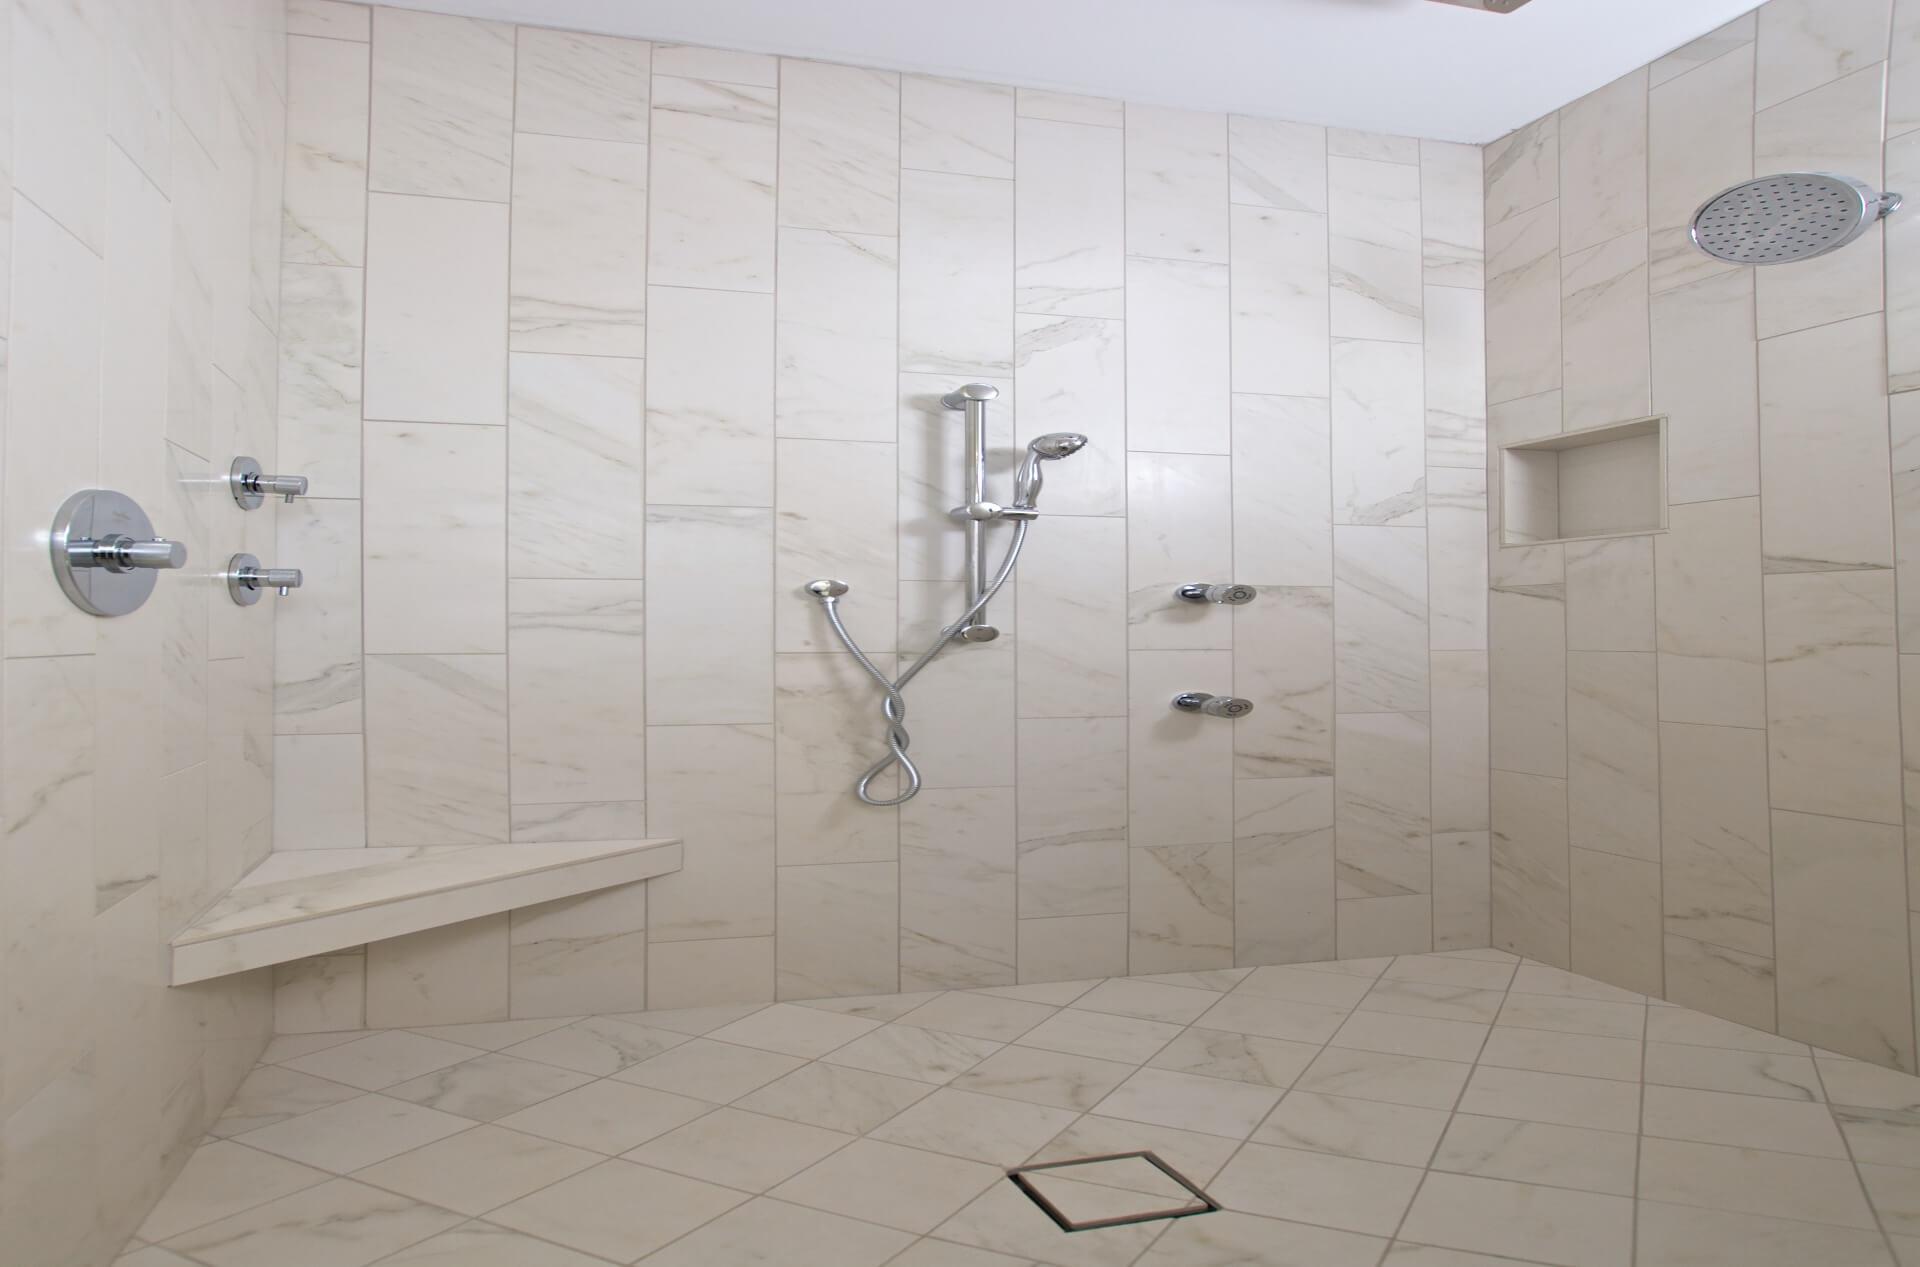 custom-shower-body-sprays-builder-1